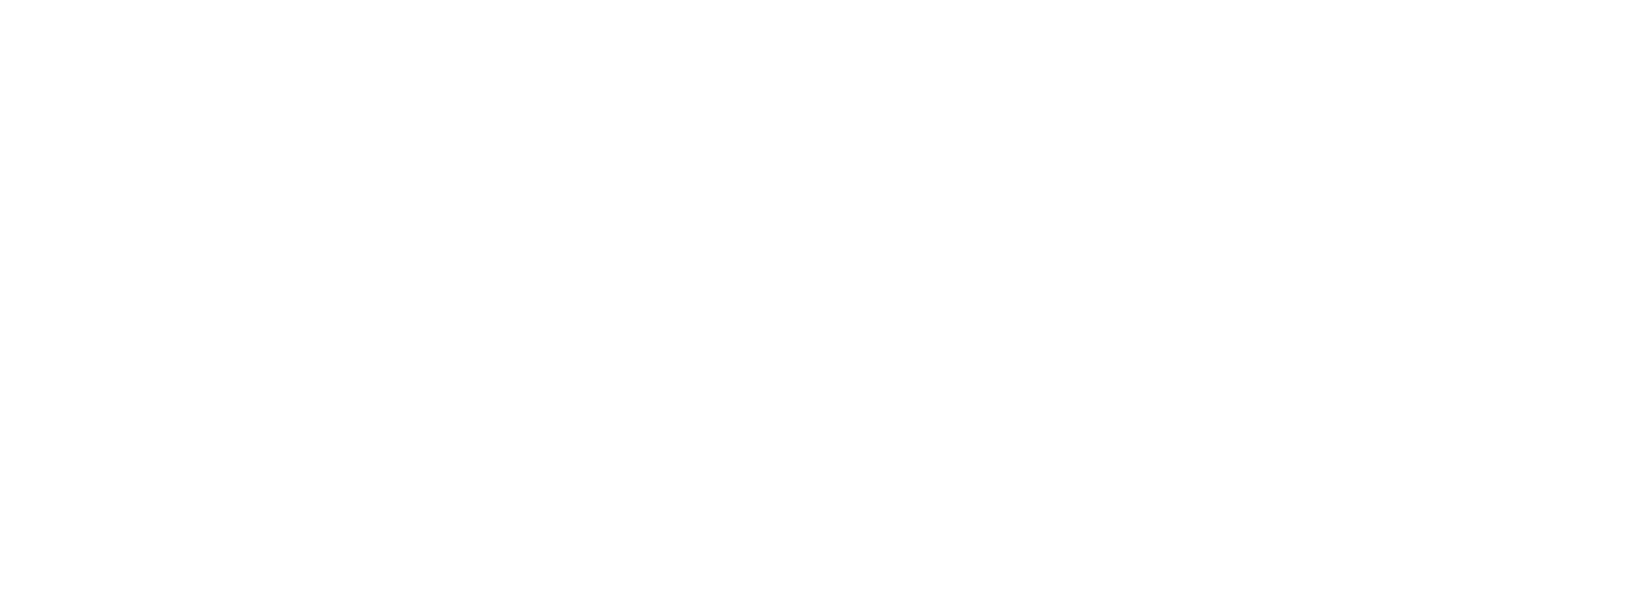 PROJECT DIGITAL